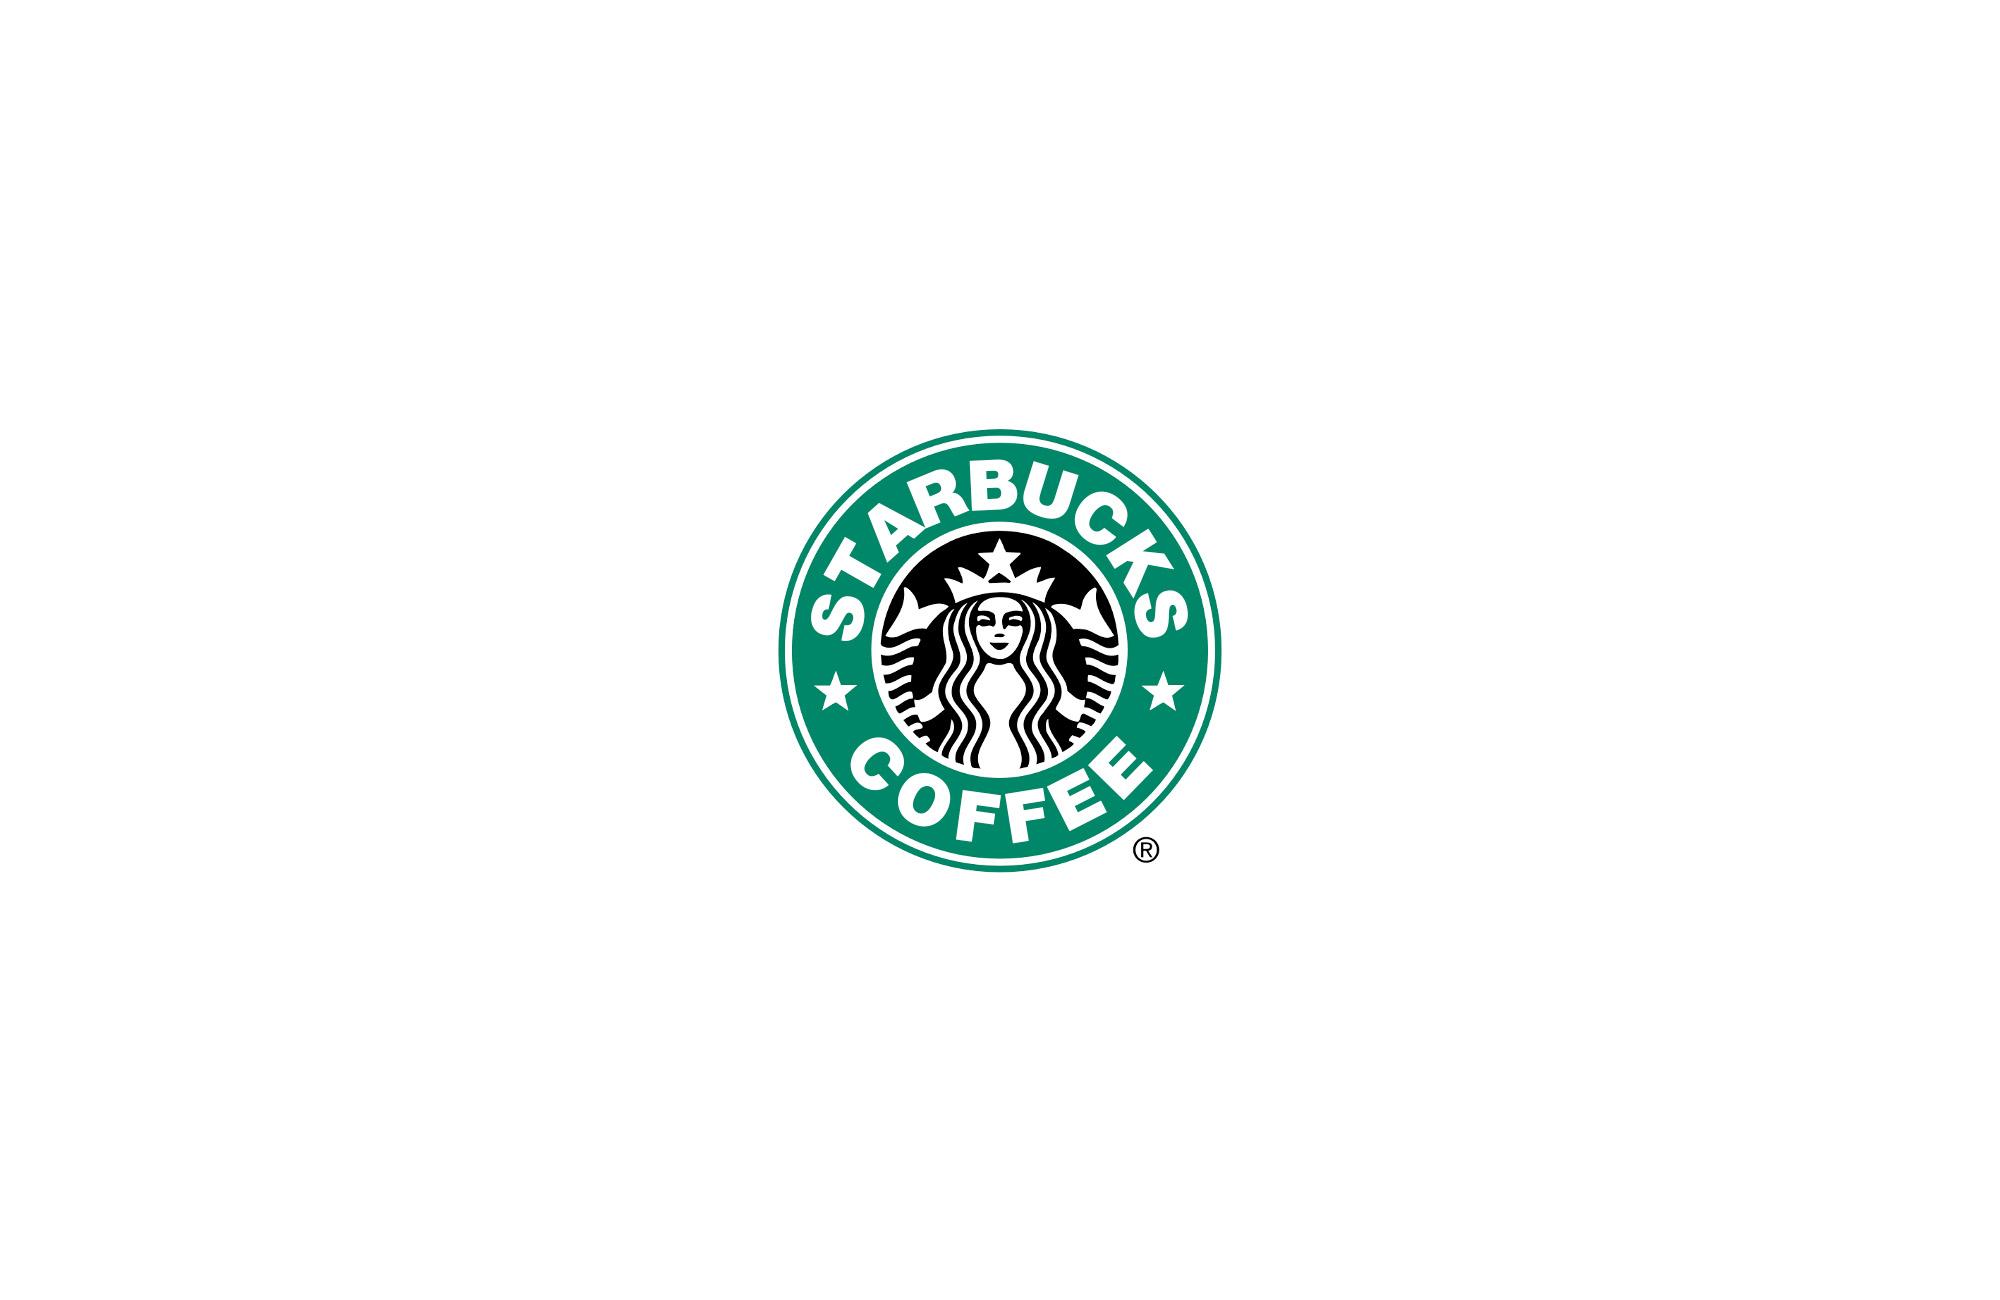 Small Starbucks Logos